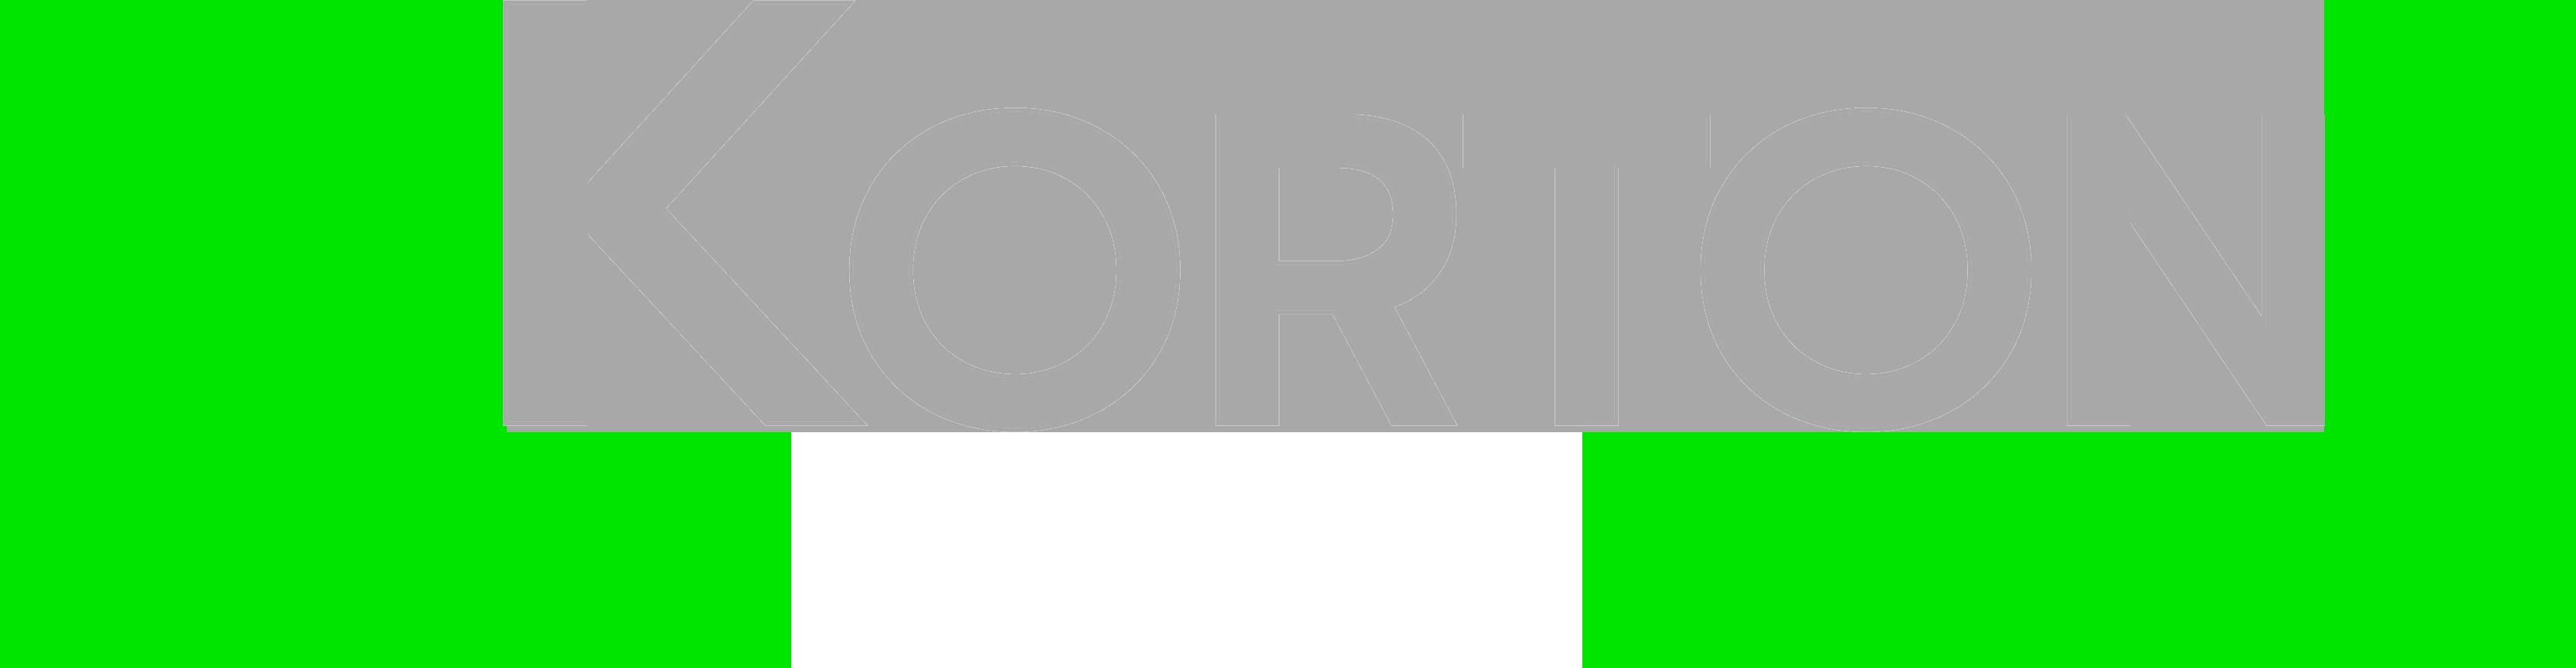 Korton Software